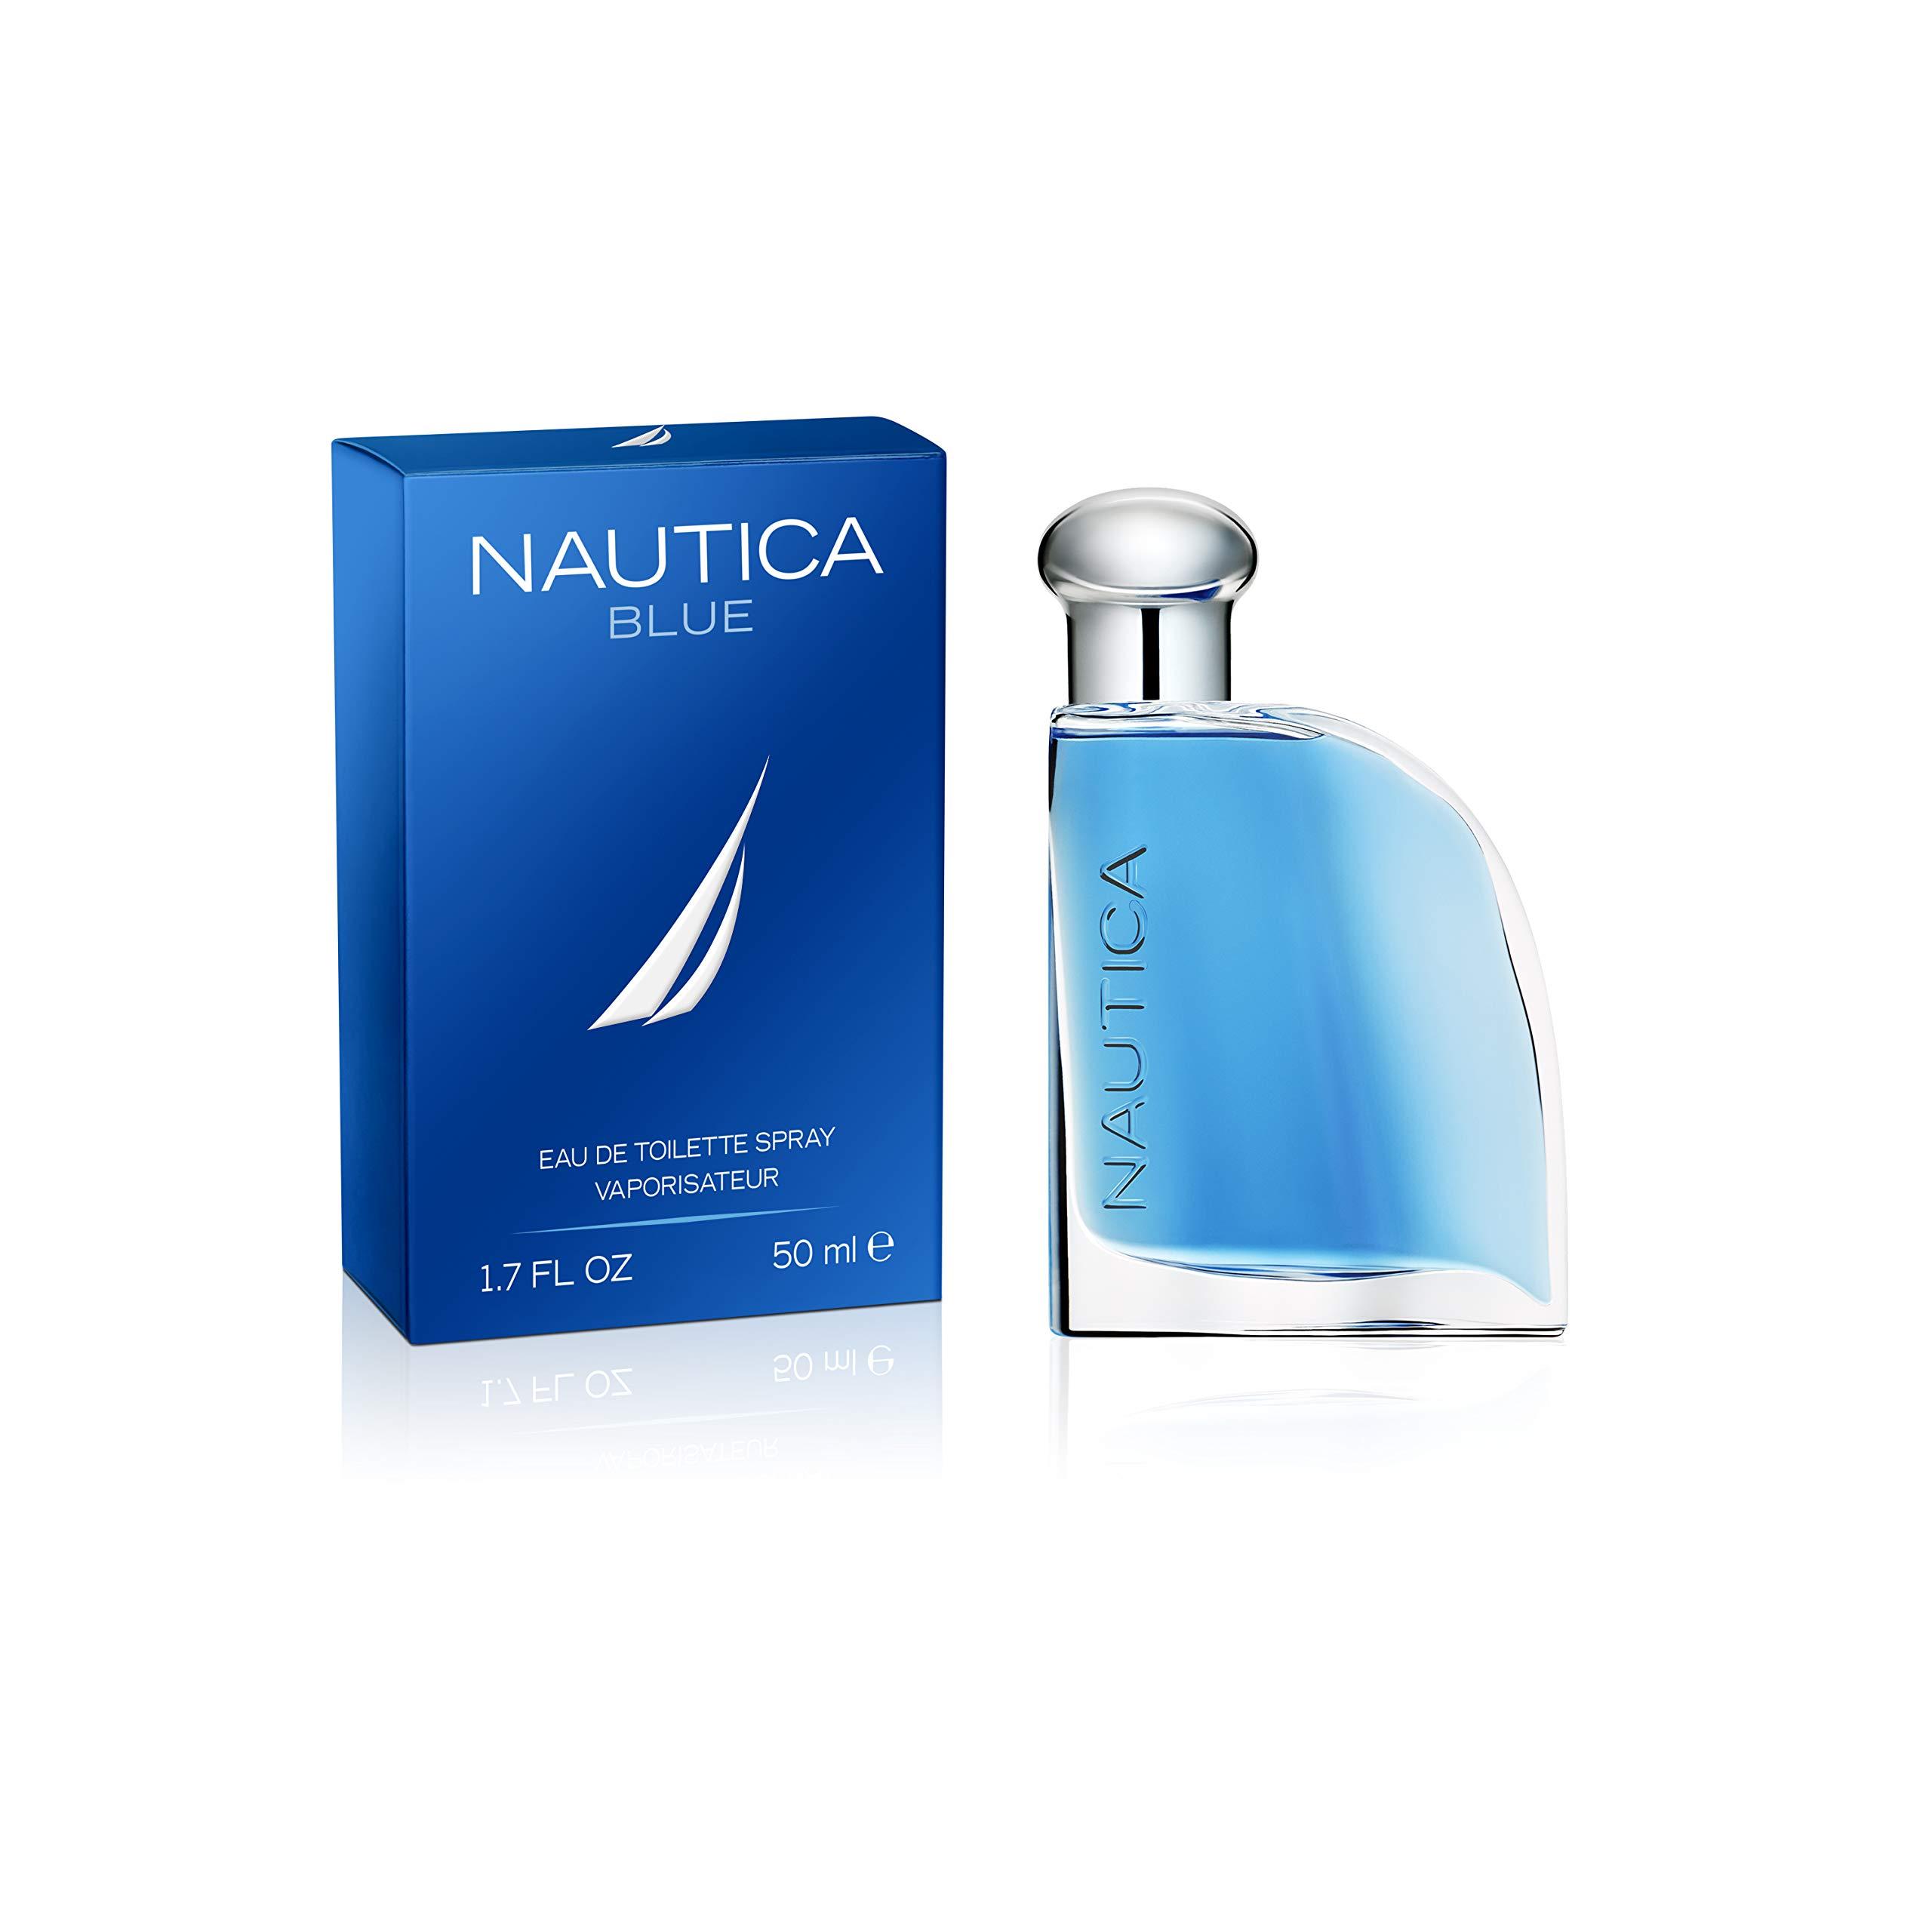 Nautica Blue 1.7 Ounce Eau De Toilette Spray for Men, 1.7 Fluid Ounces